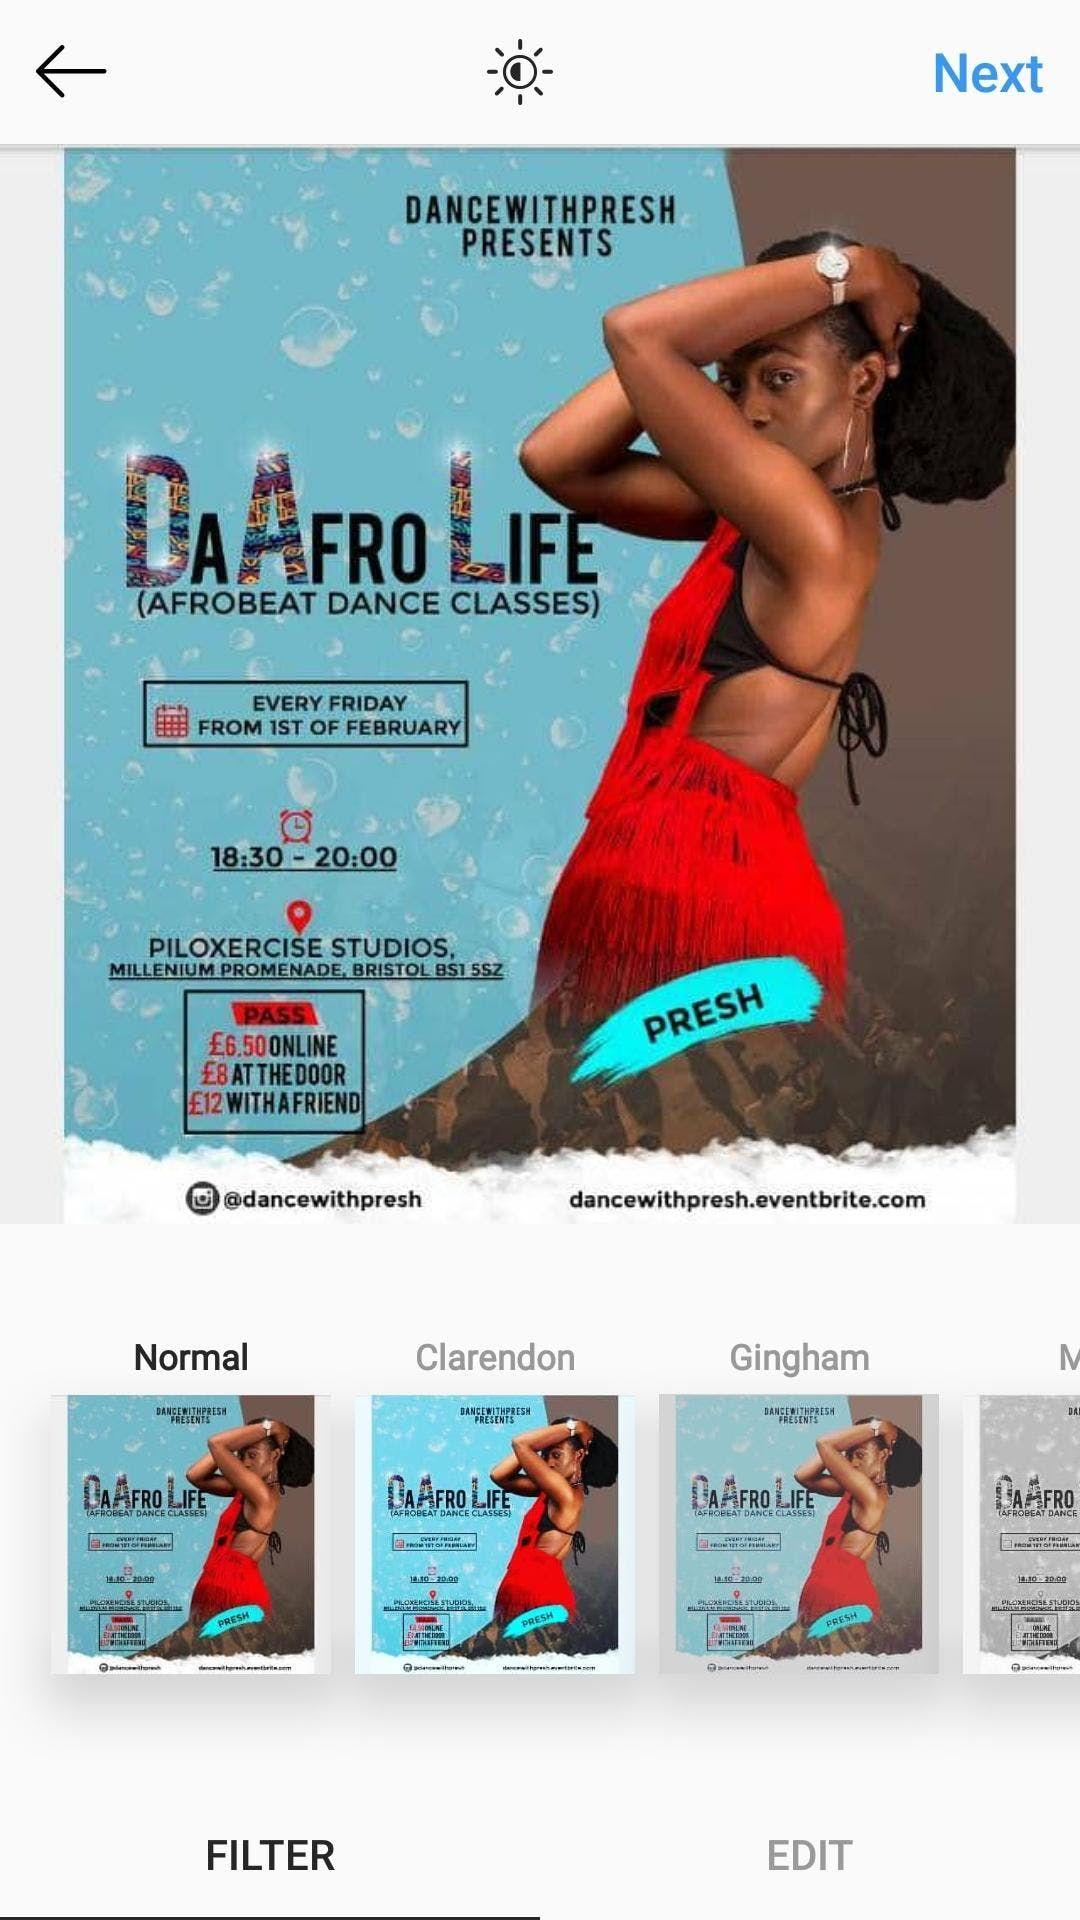 The-Afro-Life (Afrobeat dance class)